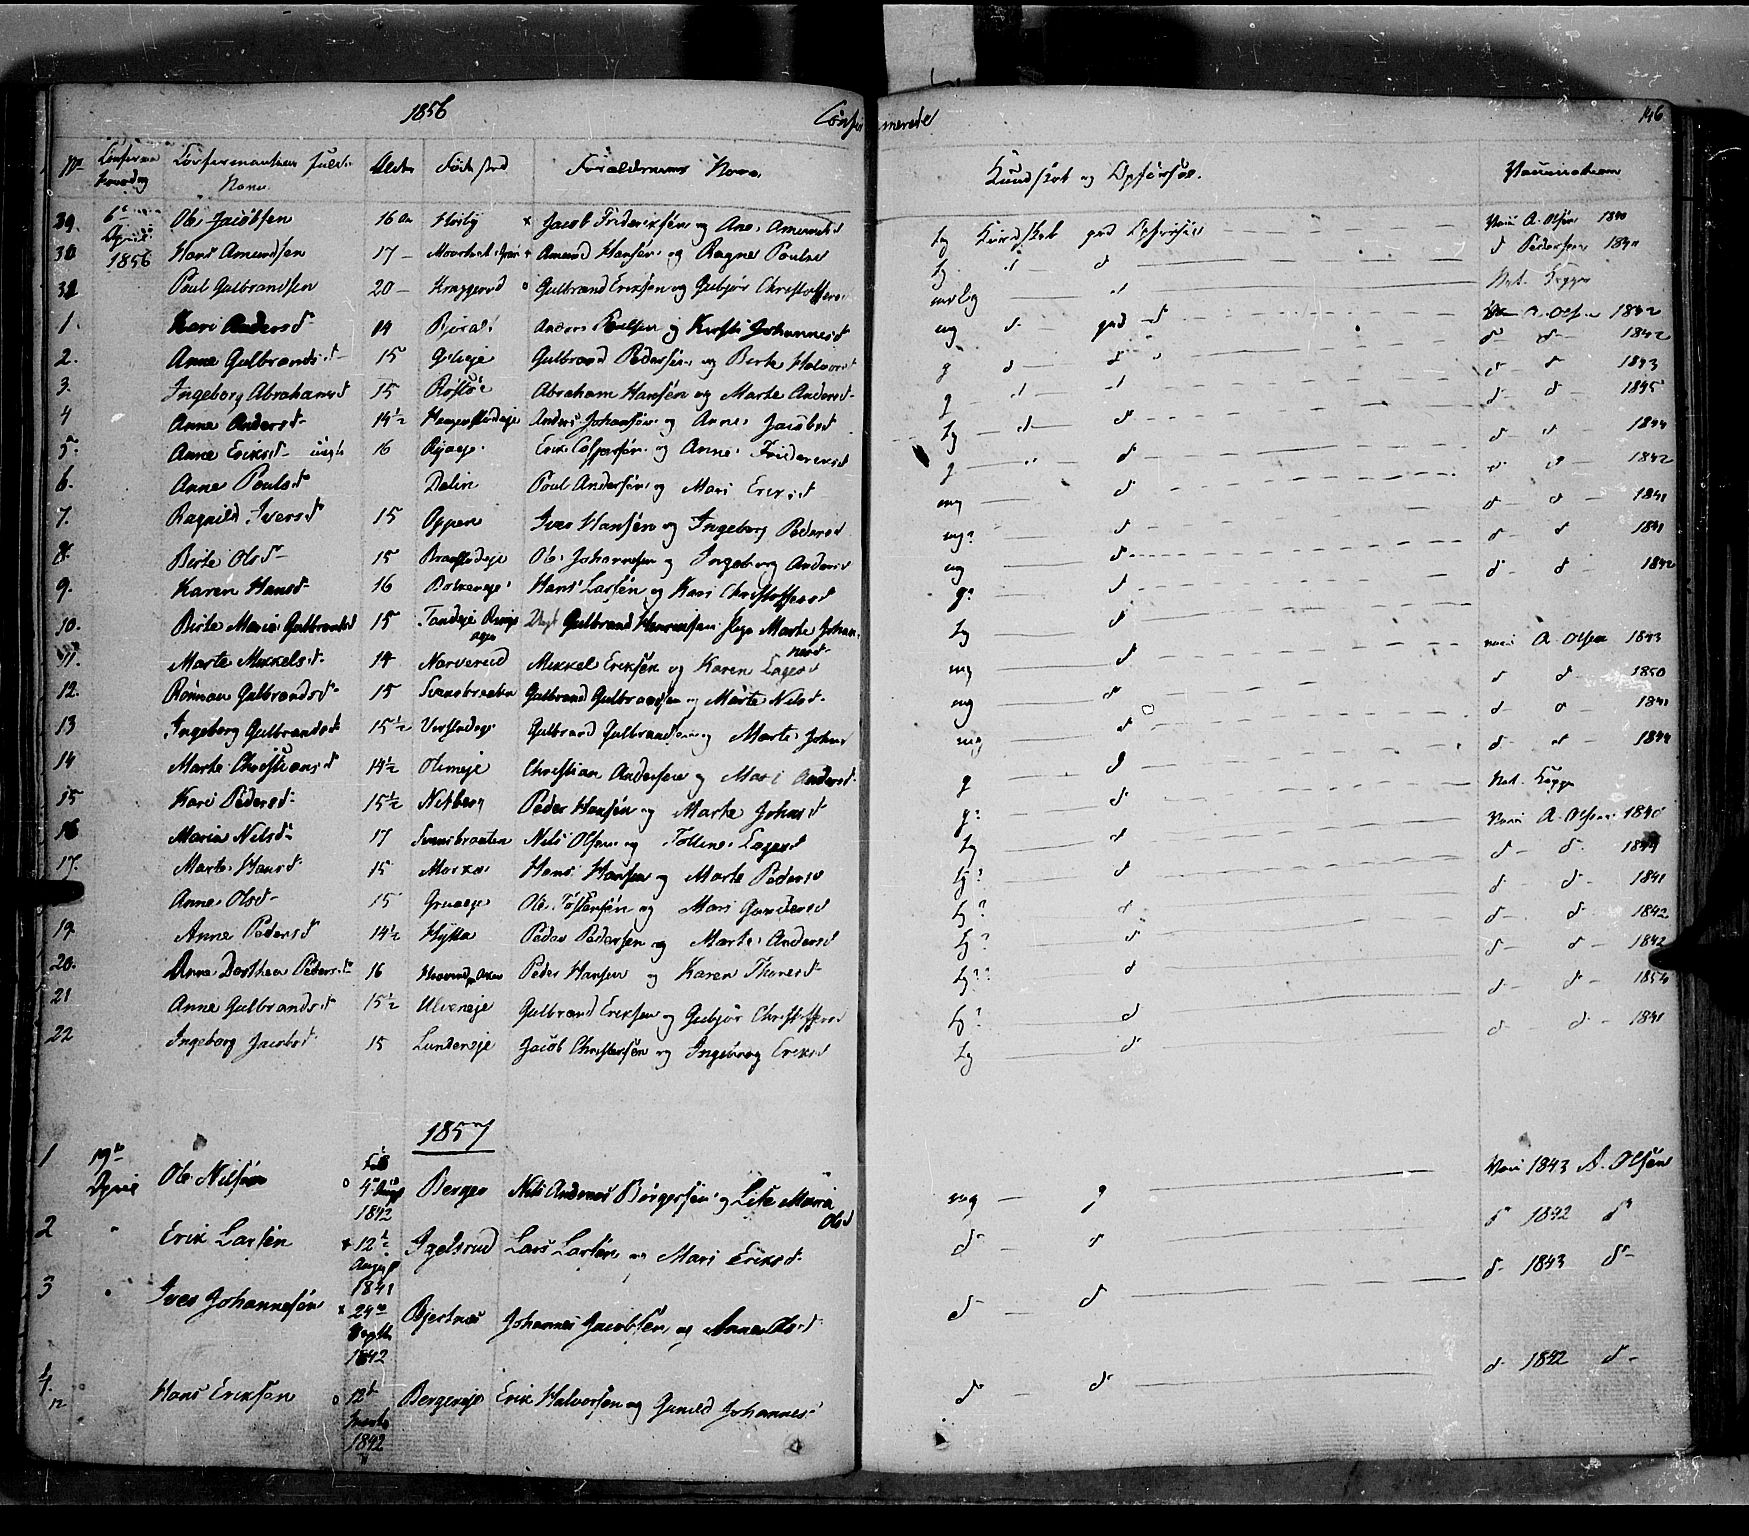 SAH, Jevnaker prestekontor, Ministerialbok nr. 6, 1837-1857, s. 146